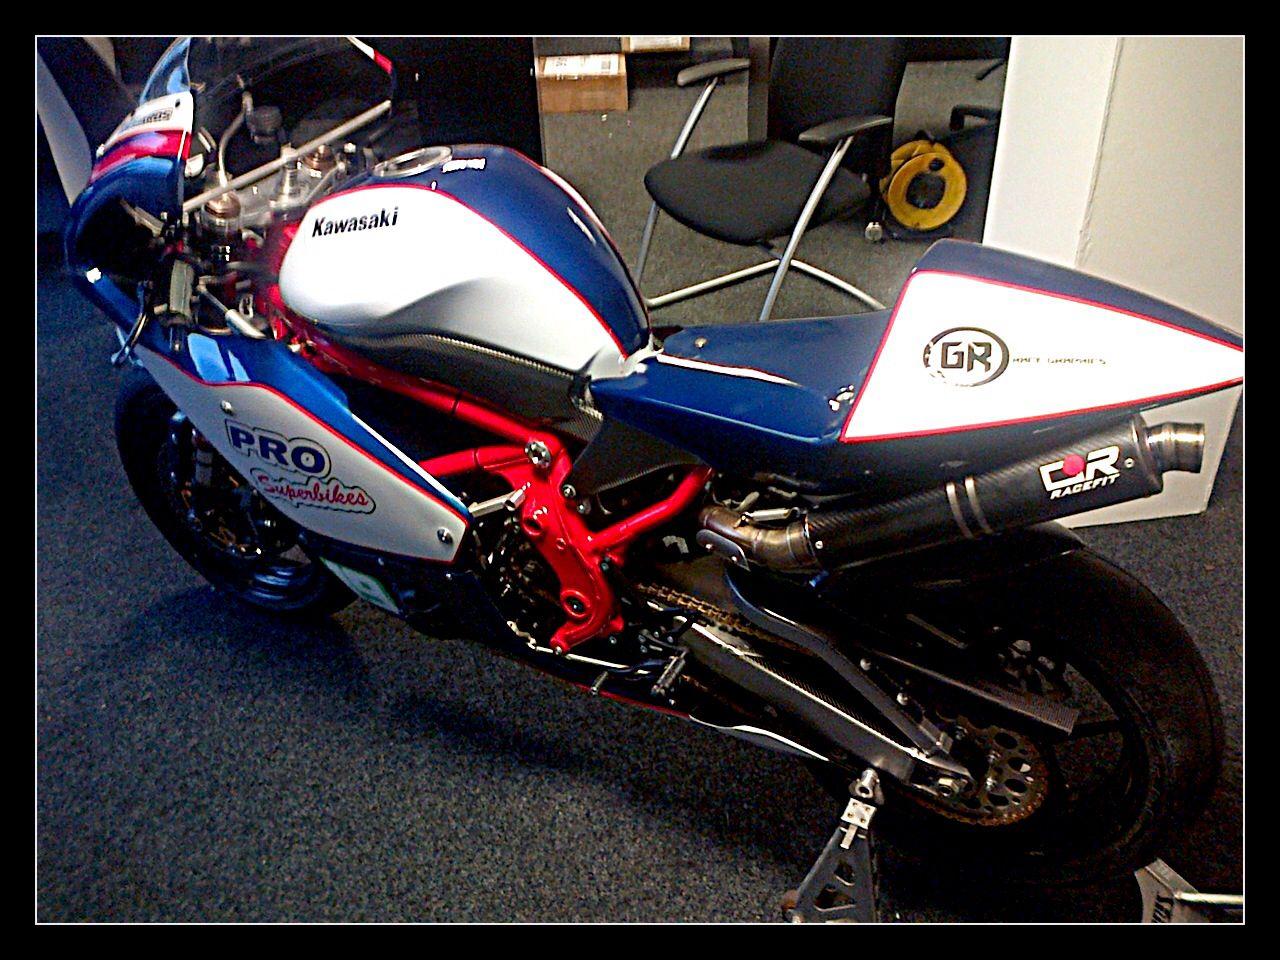 Kawasaki Er6 Supertwin Race Bike Graphics For Local Chesterfield